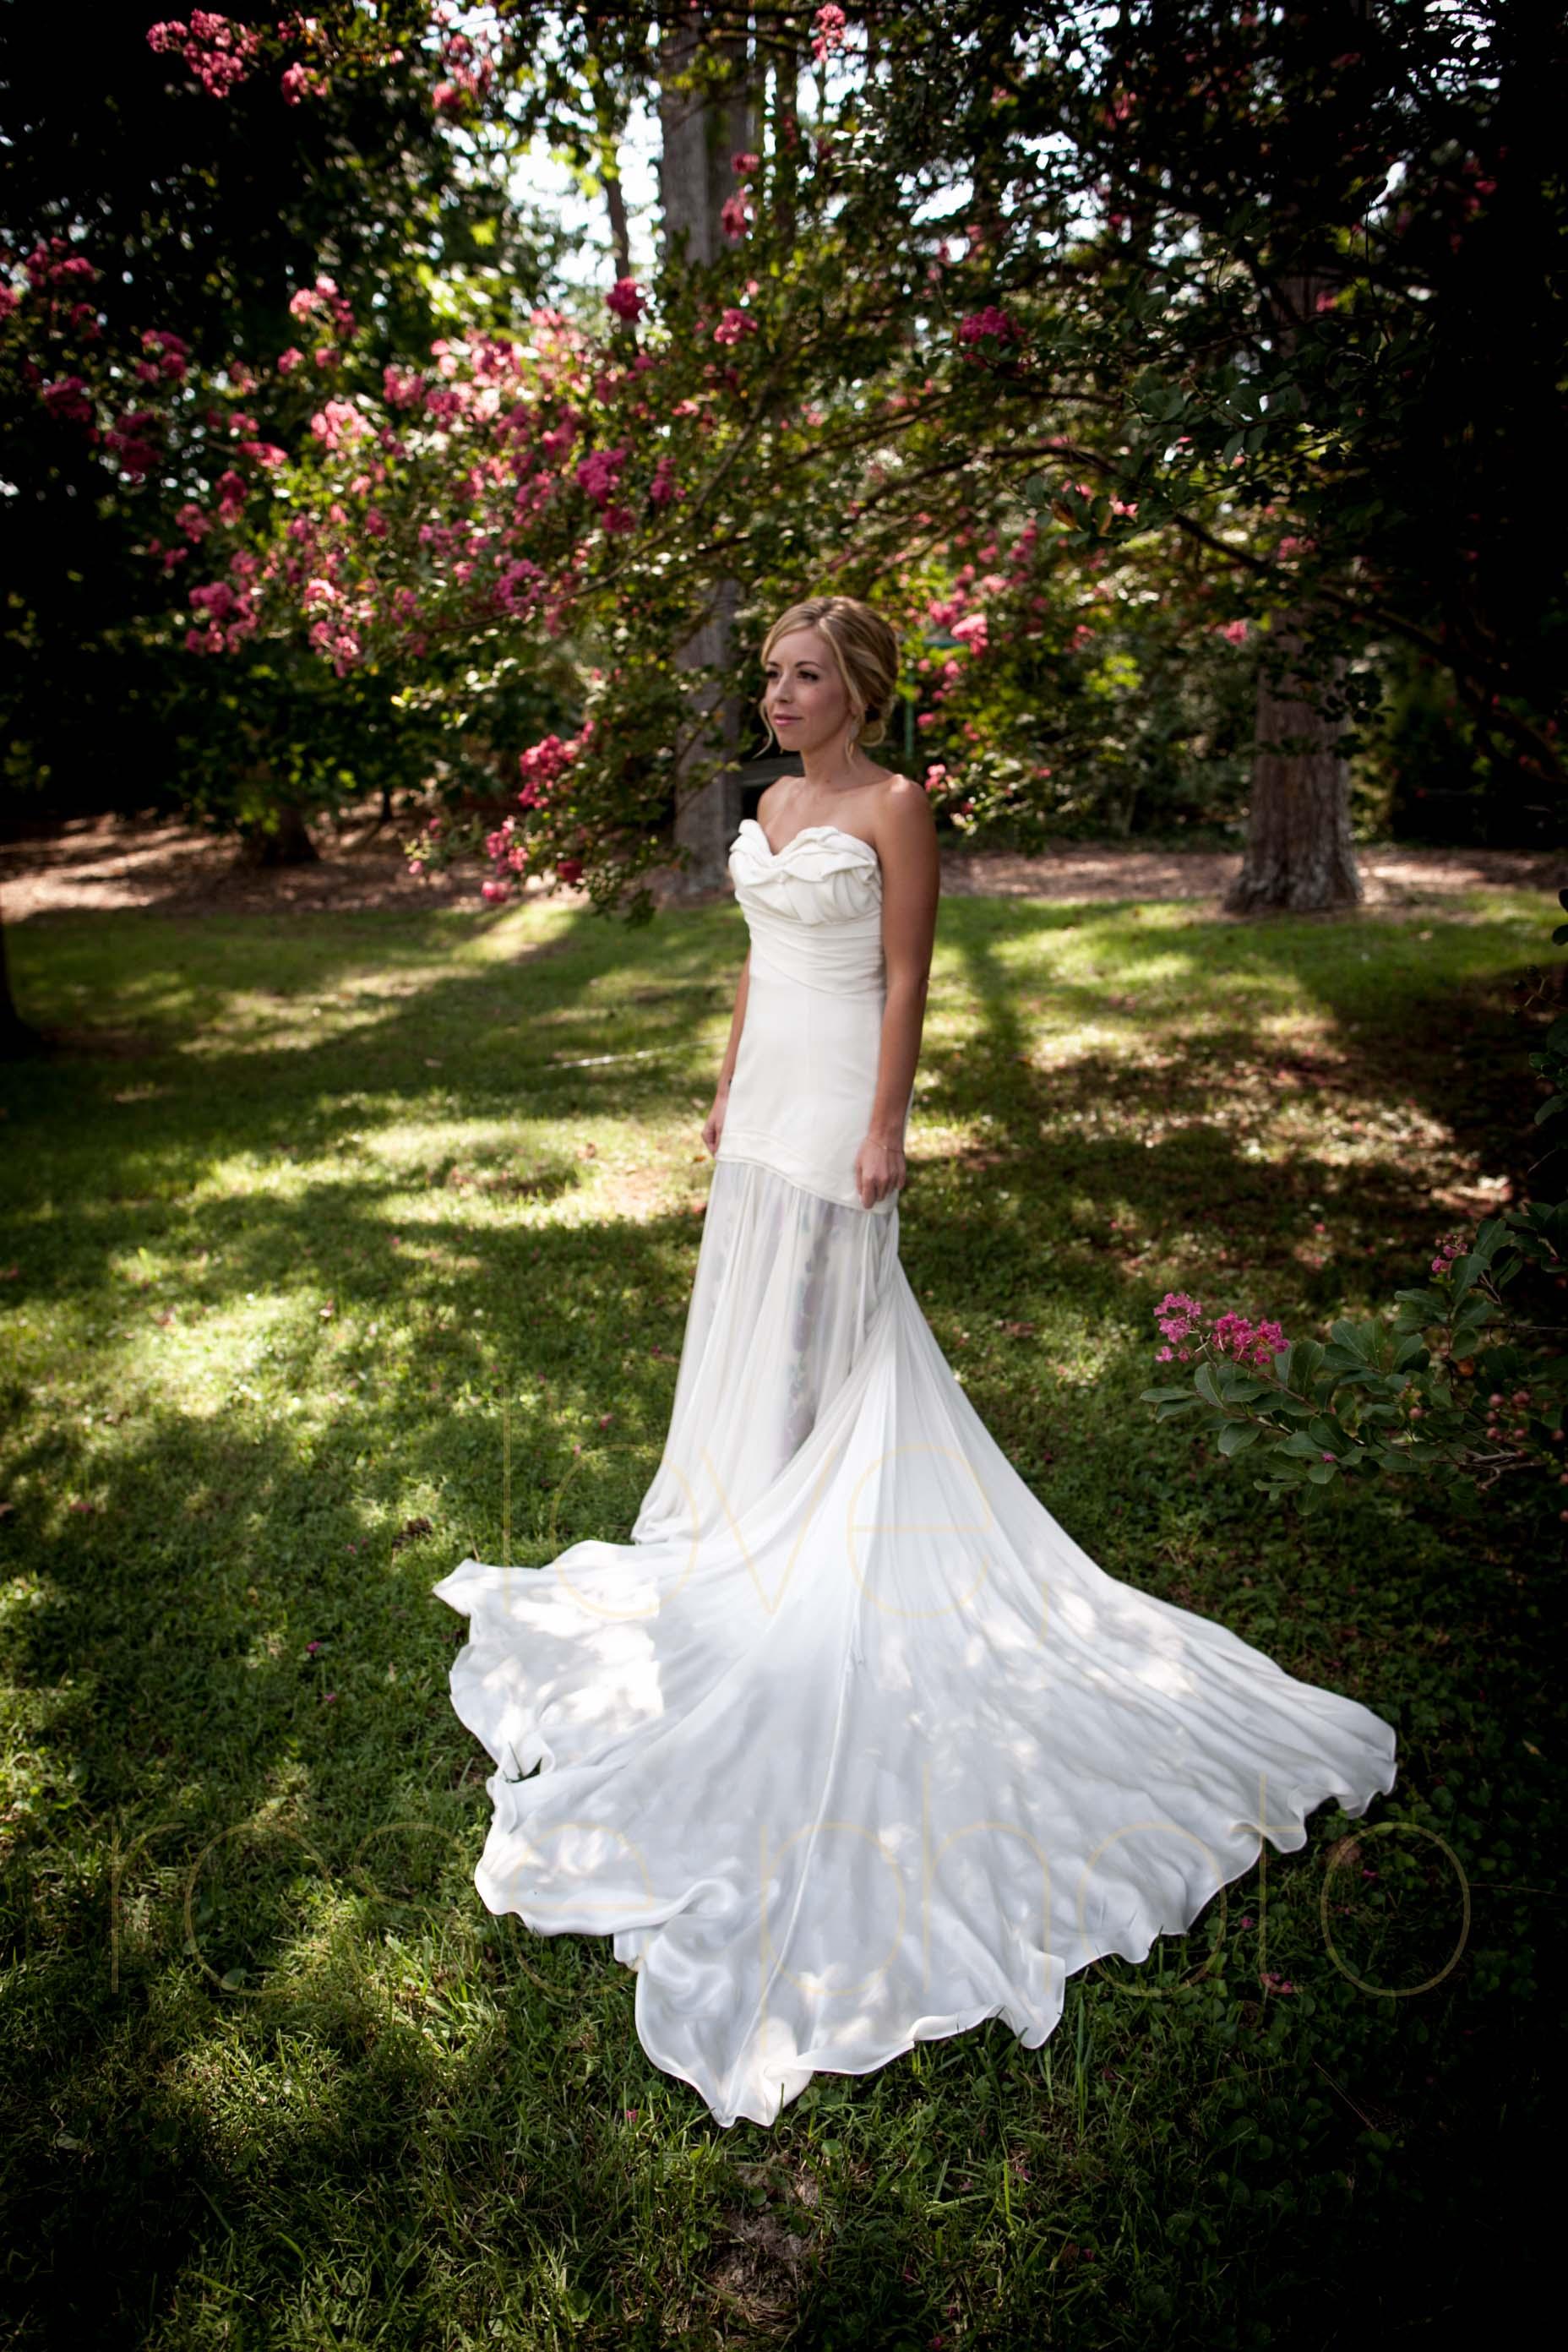 Rose Photo Asheville Wedding Photographer Nasheville Weddings Charleston Bride Chicago photojournalist weddings -18.jpg